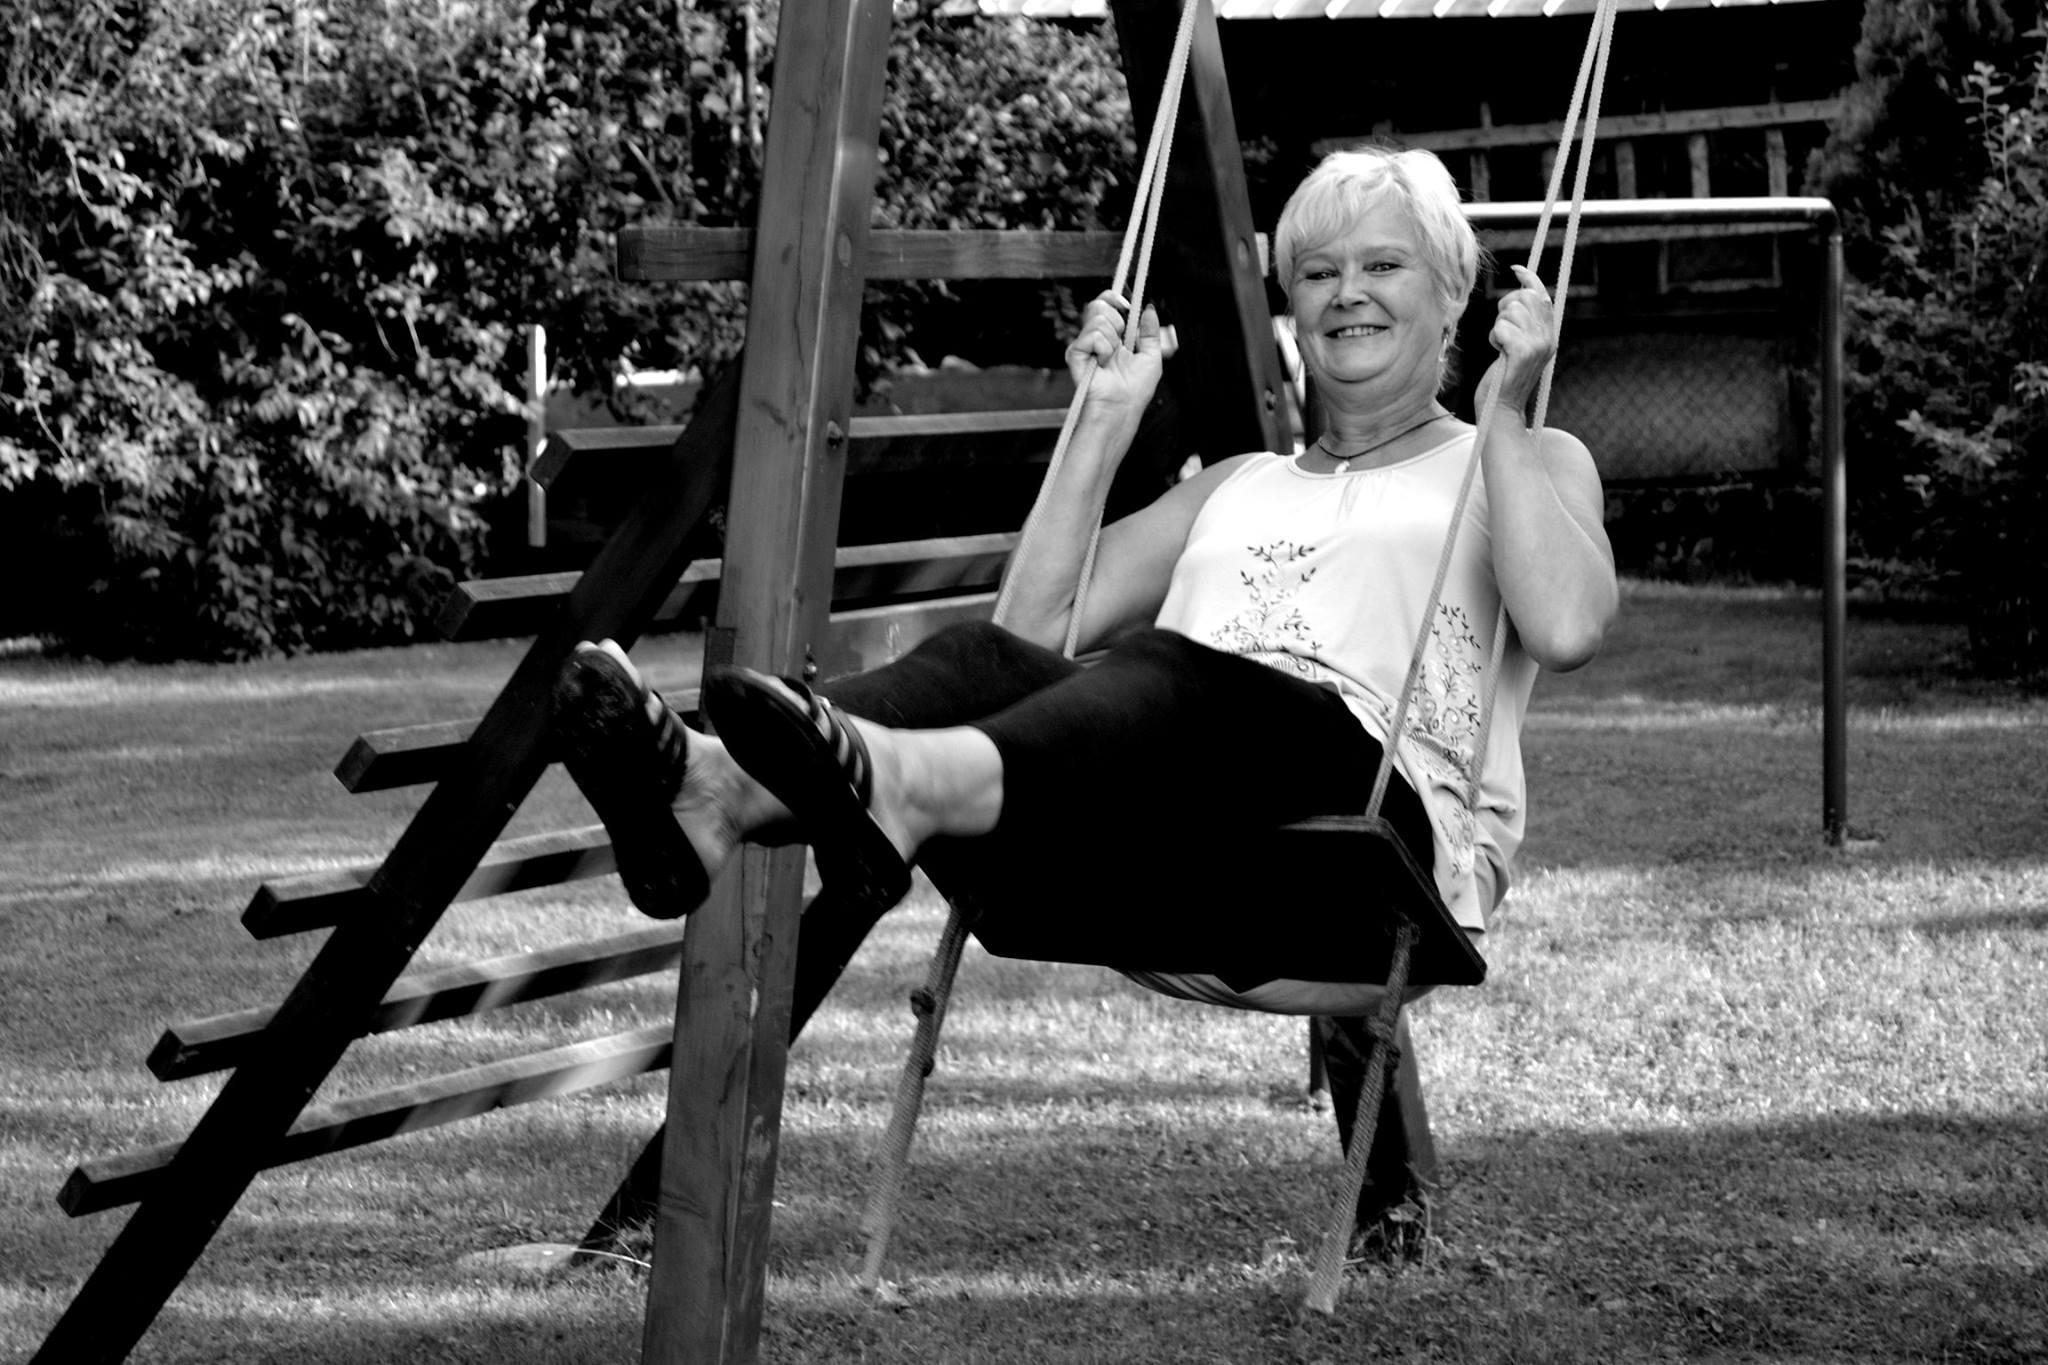 Woman Swinging – Michaela Bozonova, Flickr